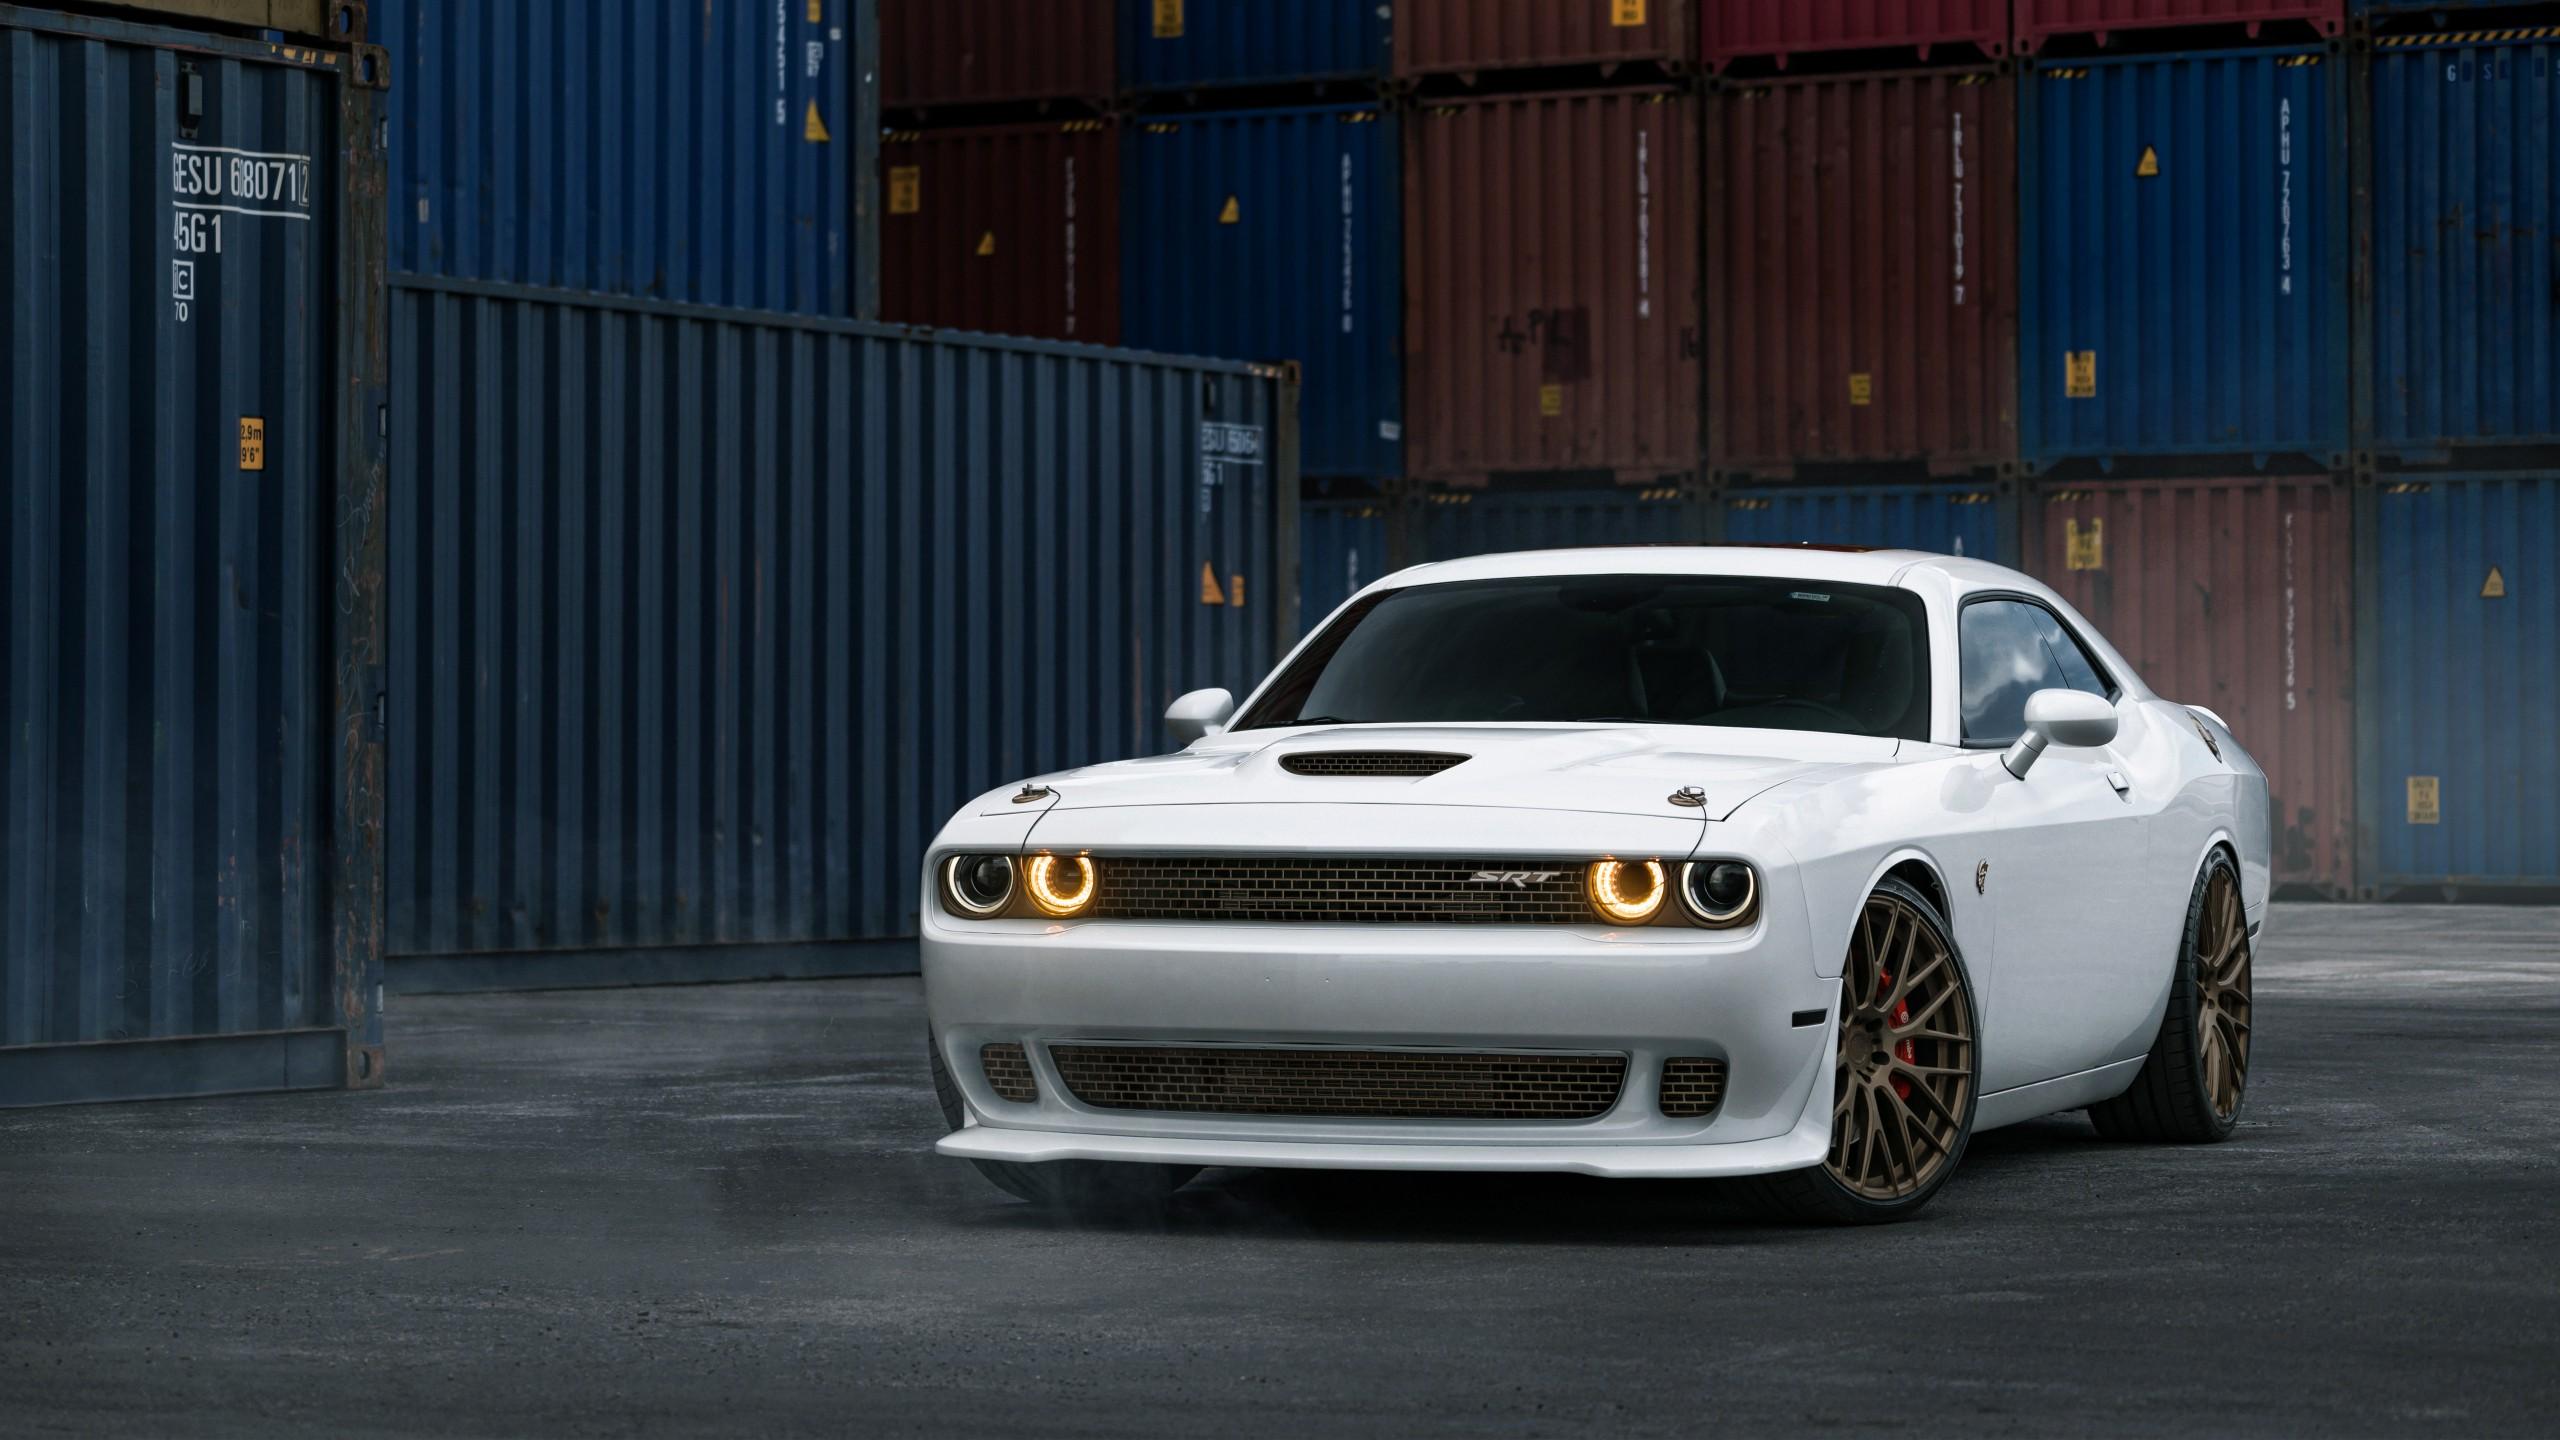 Dodge Challenger Srt Hellcat White Wallpaper Hd Car Wallpapers Id 6945